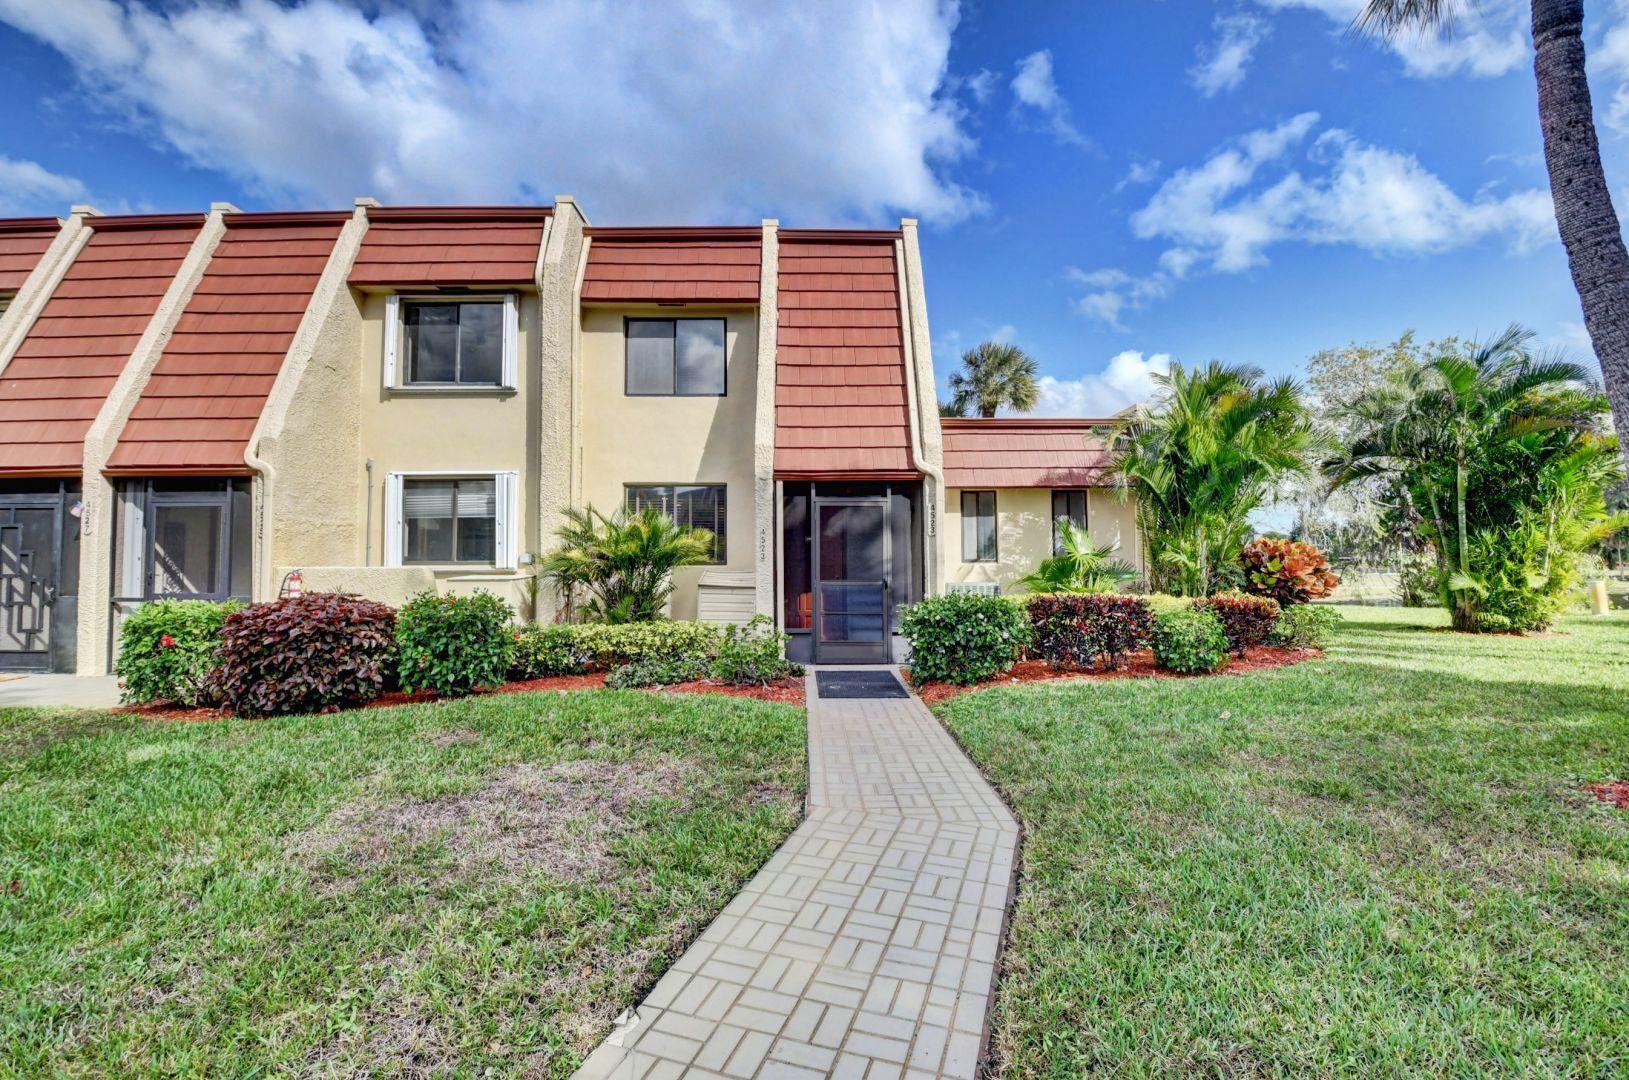 4523 Luxemburg Ct Court, Lake Worth, FL 33467 - #: RX-10680990